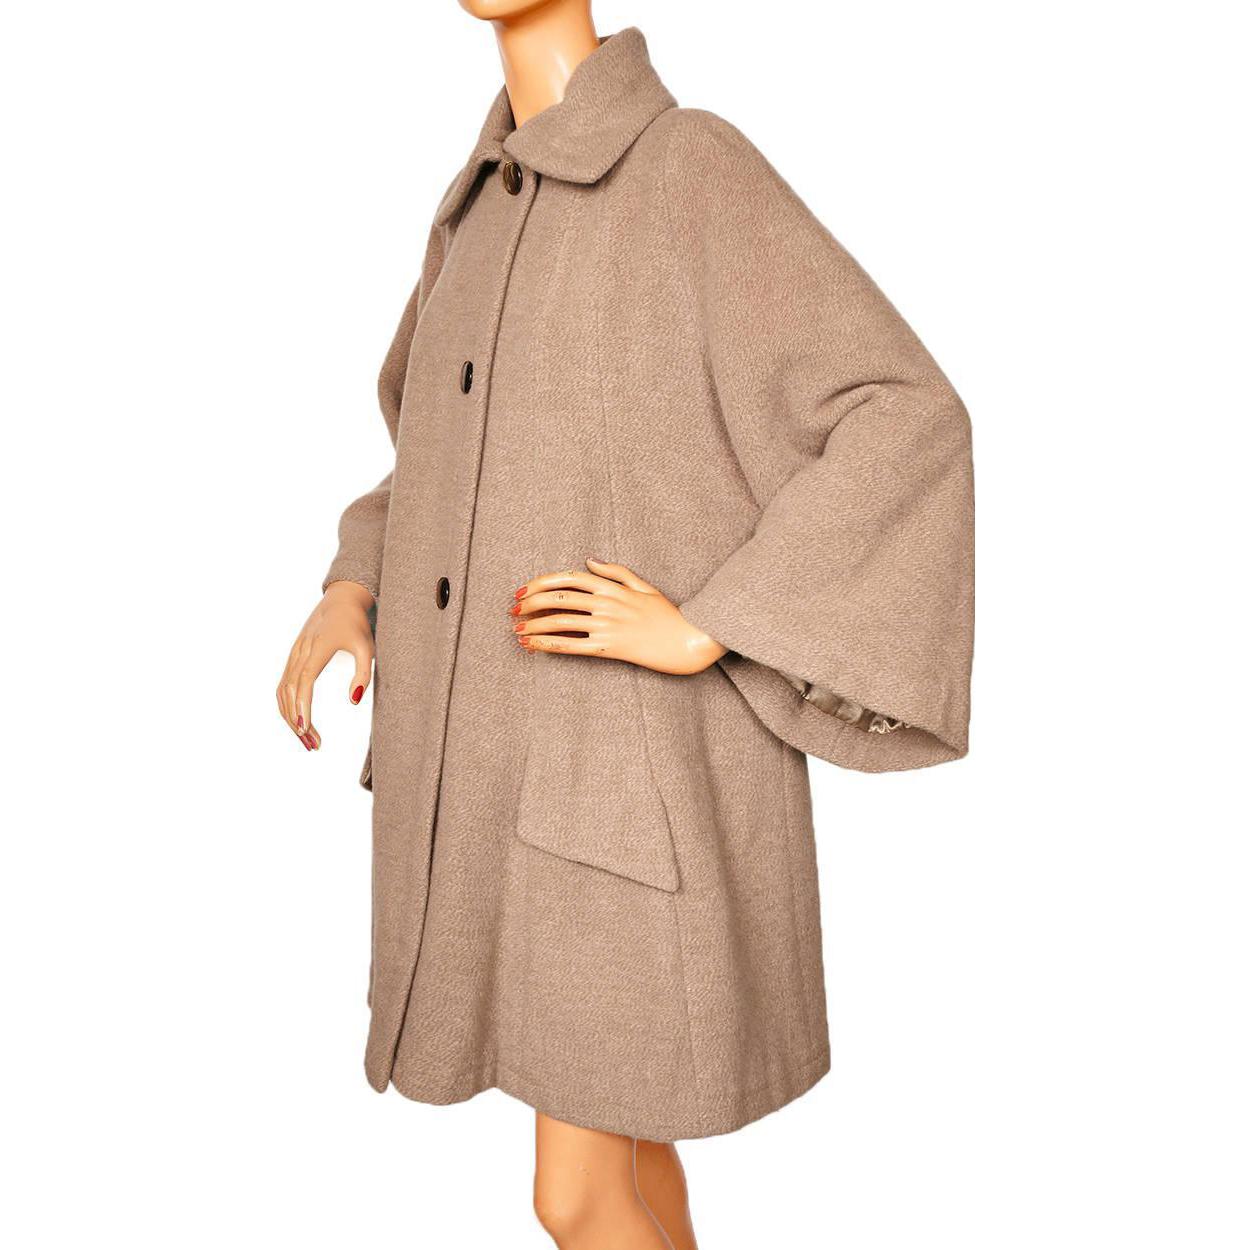 Vintage 1950s Swing Coat Beige Wool Ladies Size L From